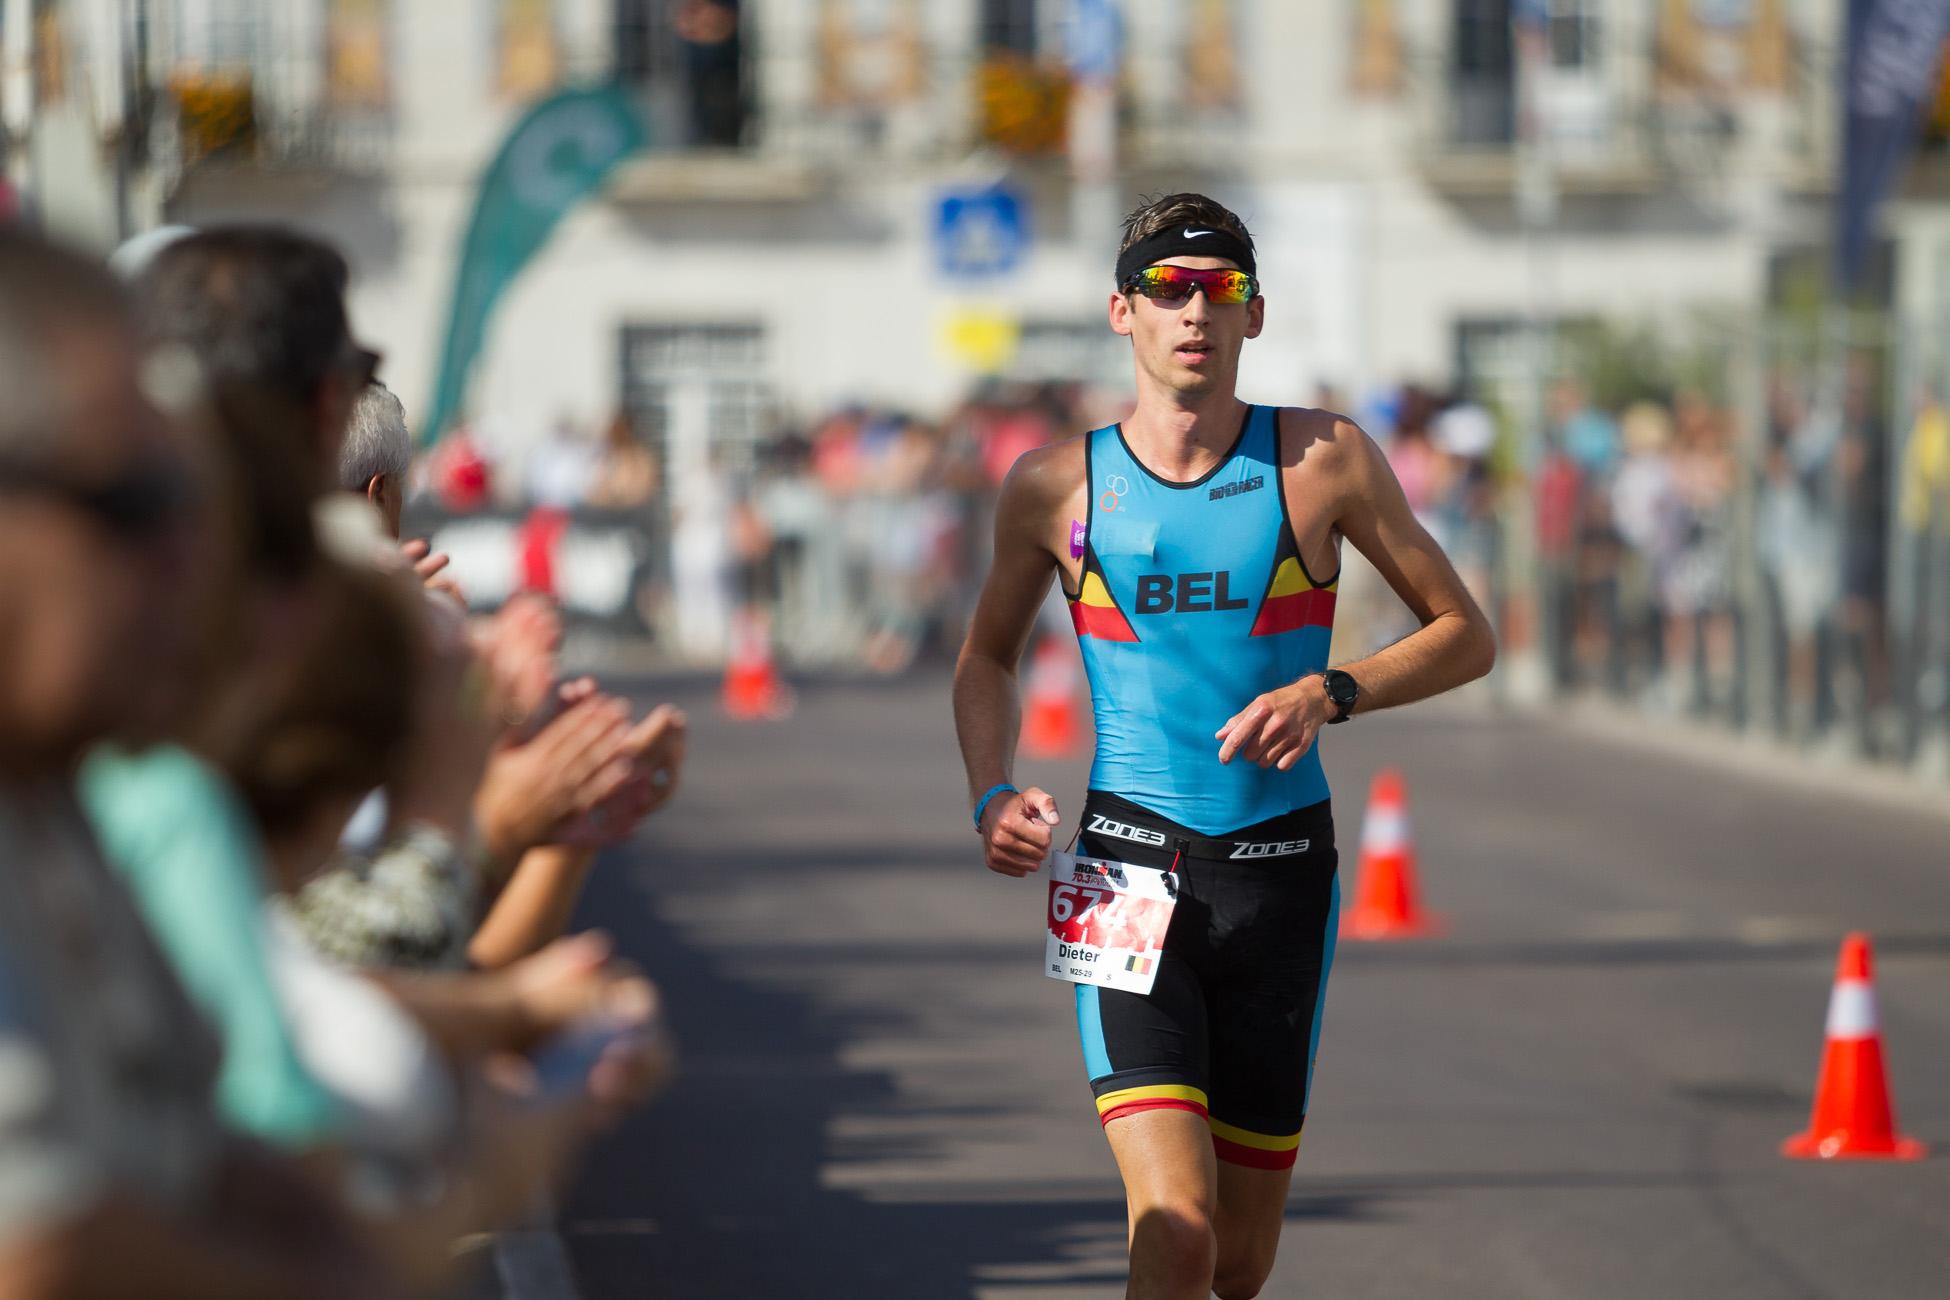 ironman-triathlon-fitness-lifestyle-sport-athlete-photography-013.jpg